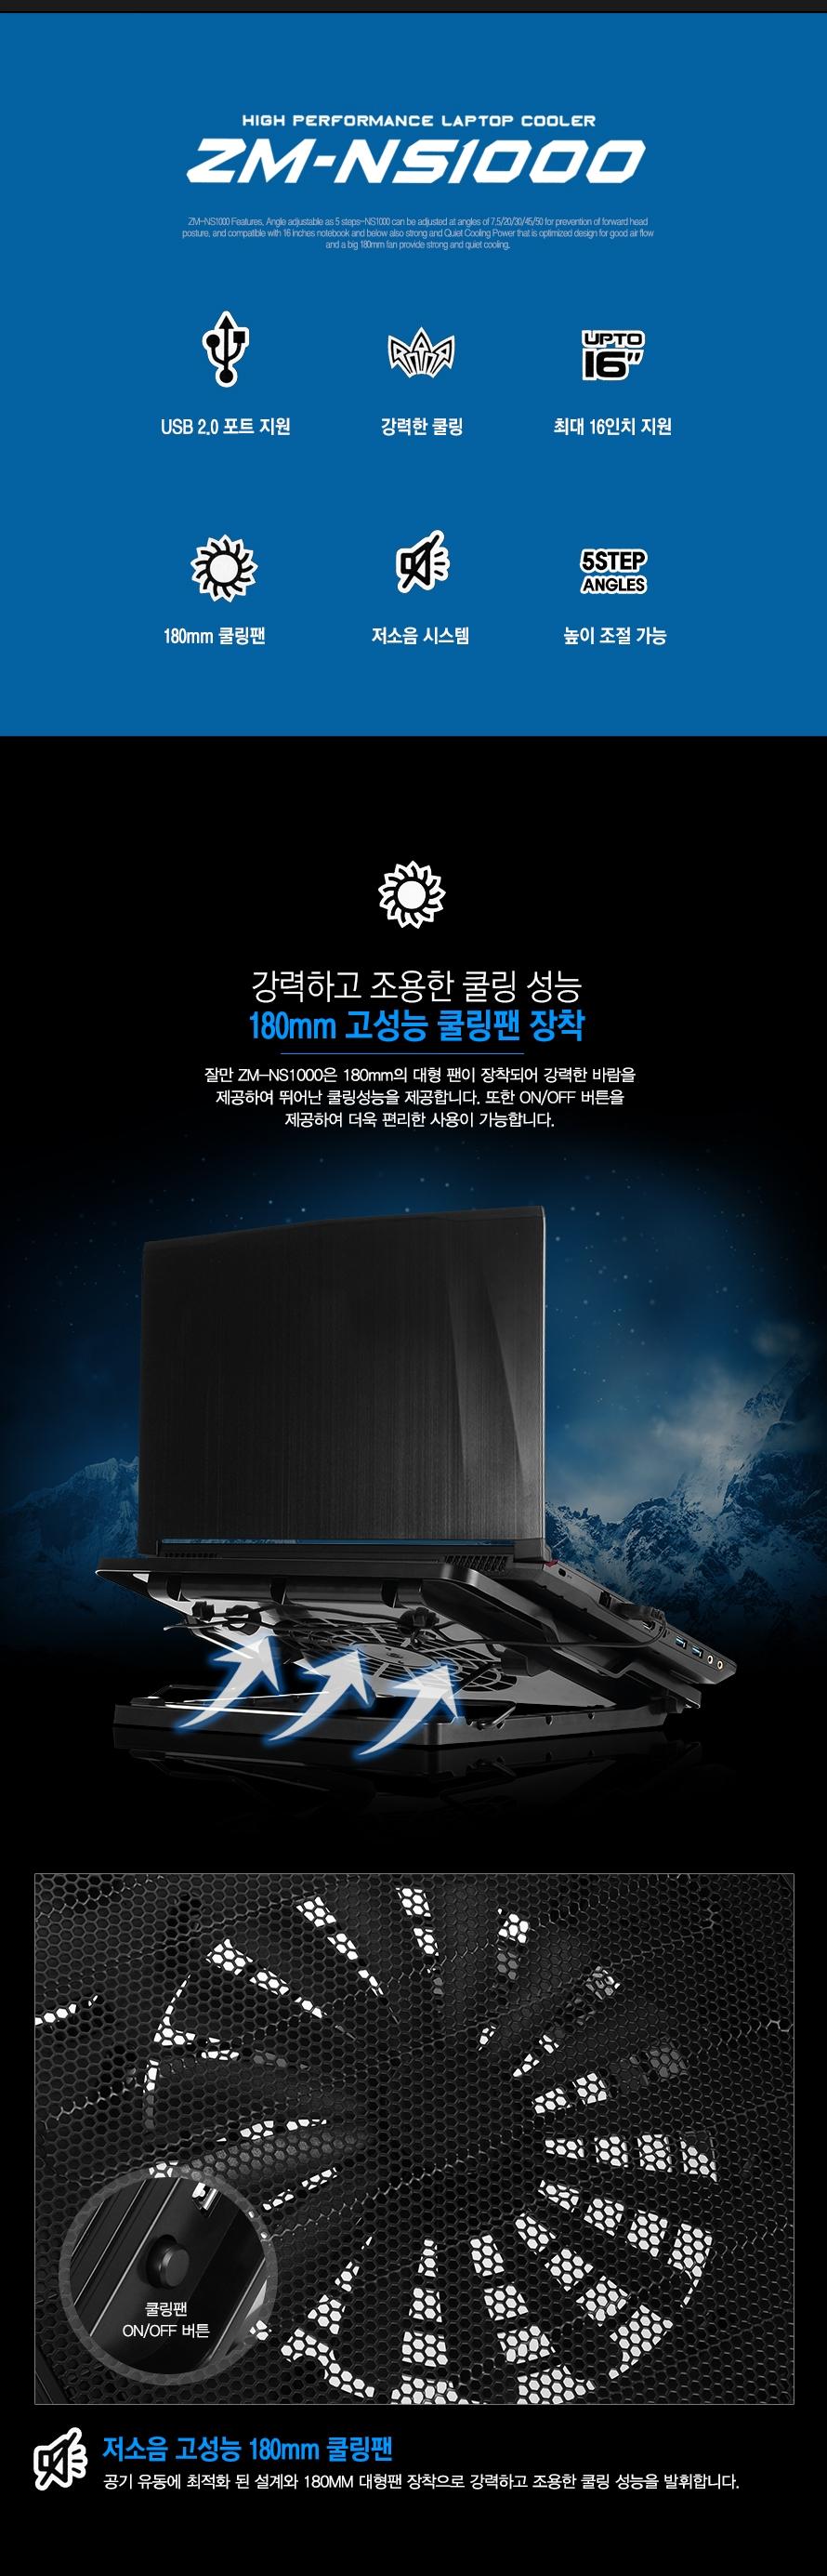 ZM-NS1000 특장점 USB 2.0 포트 강력한 쿨링 최대 16인치 지원 180mm 쿨링팬 저소음 높이조절 잘만 ZM-NS1000은 180mm의 대형 팬이 장착되어 강력한 바람을 제공하여 뛰어난 쿨링성능을 제공합니다. 또한 ON/OFF 버튼을 제공하여 더욱 편리한 사용이 가능합니다.